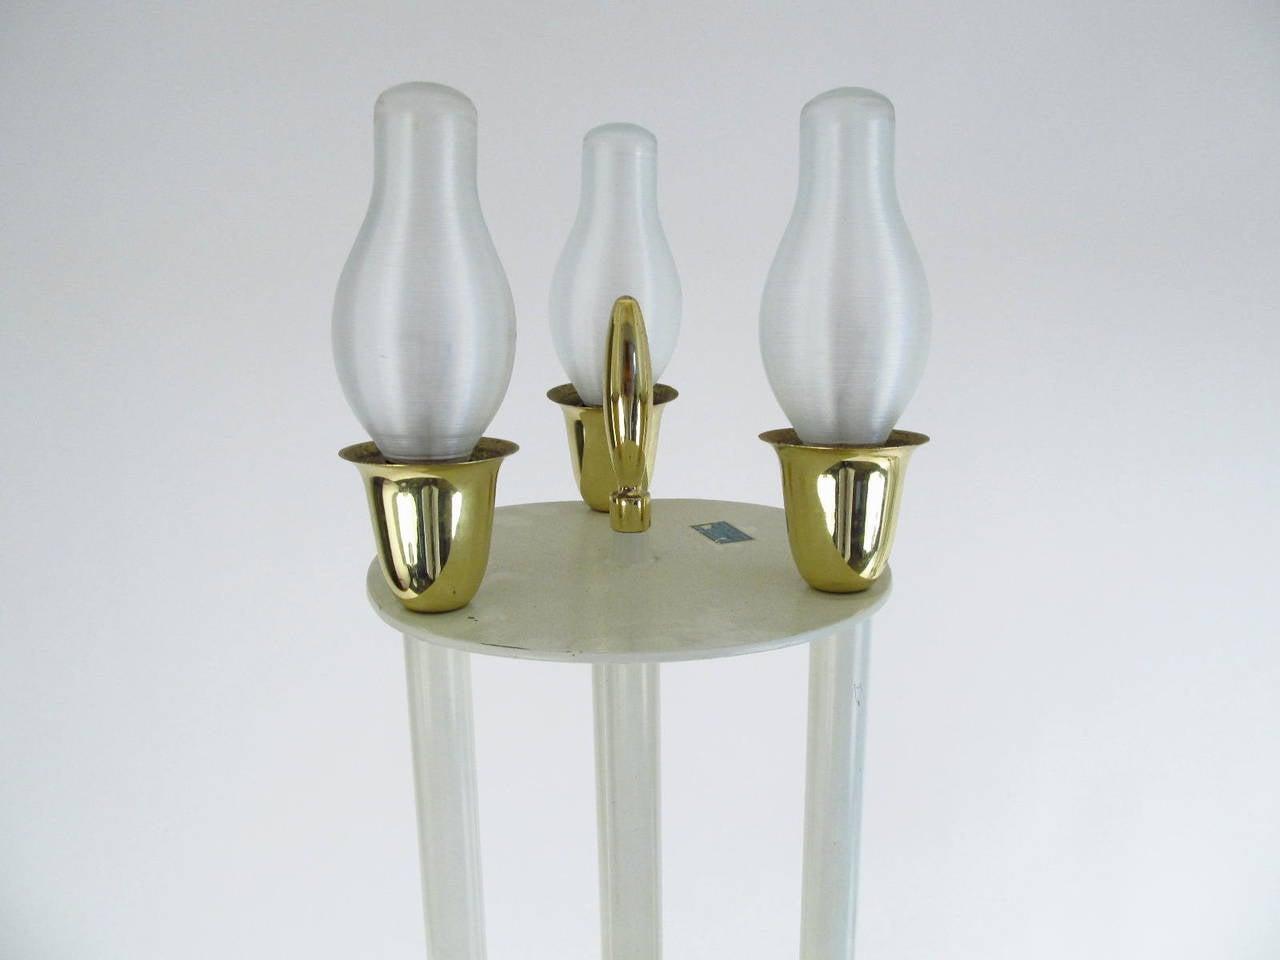 Pair of Laurel Lamp Co. Elaborate Candelabra Table Lamps 6